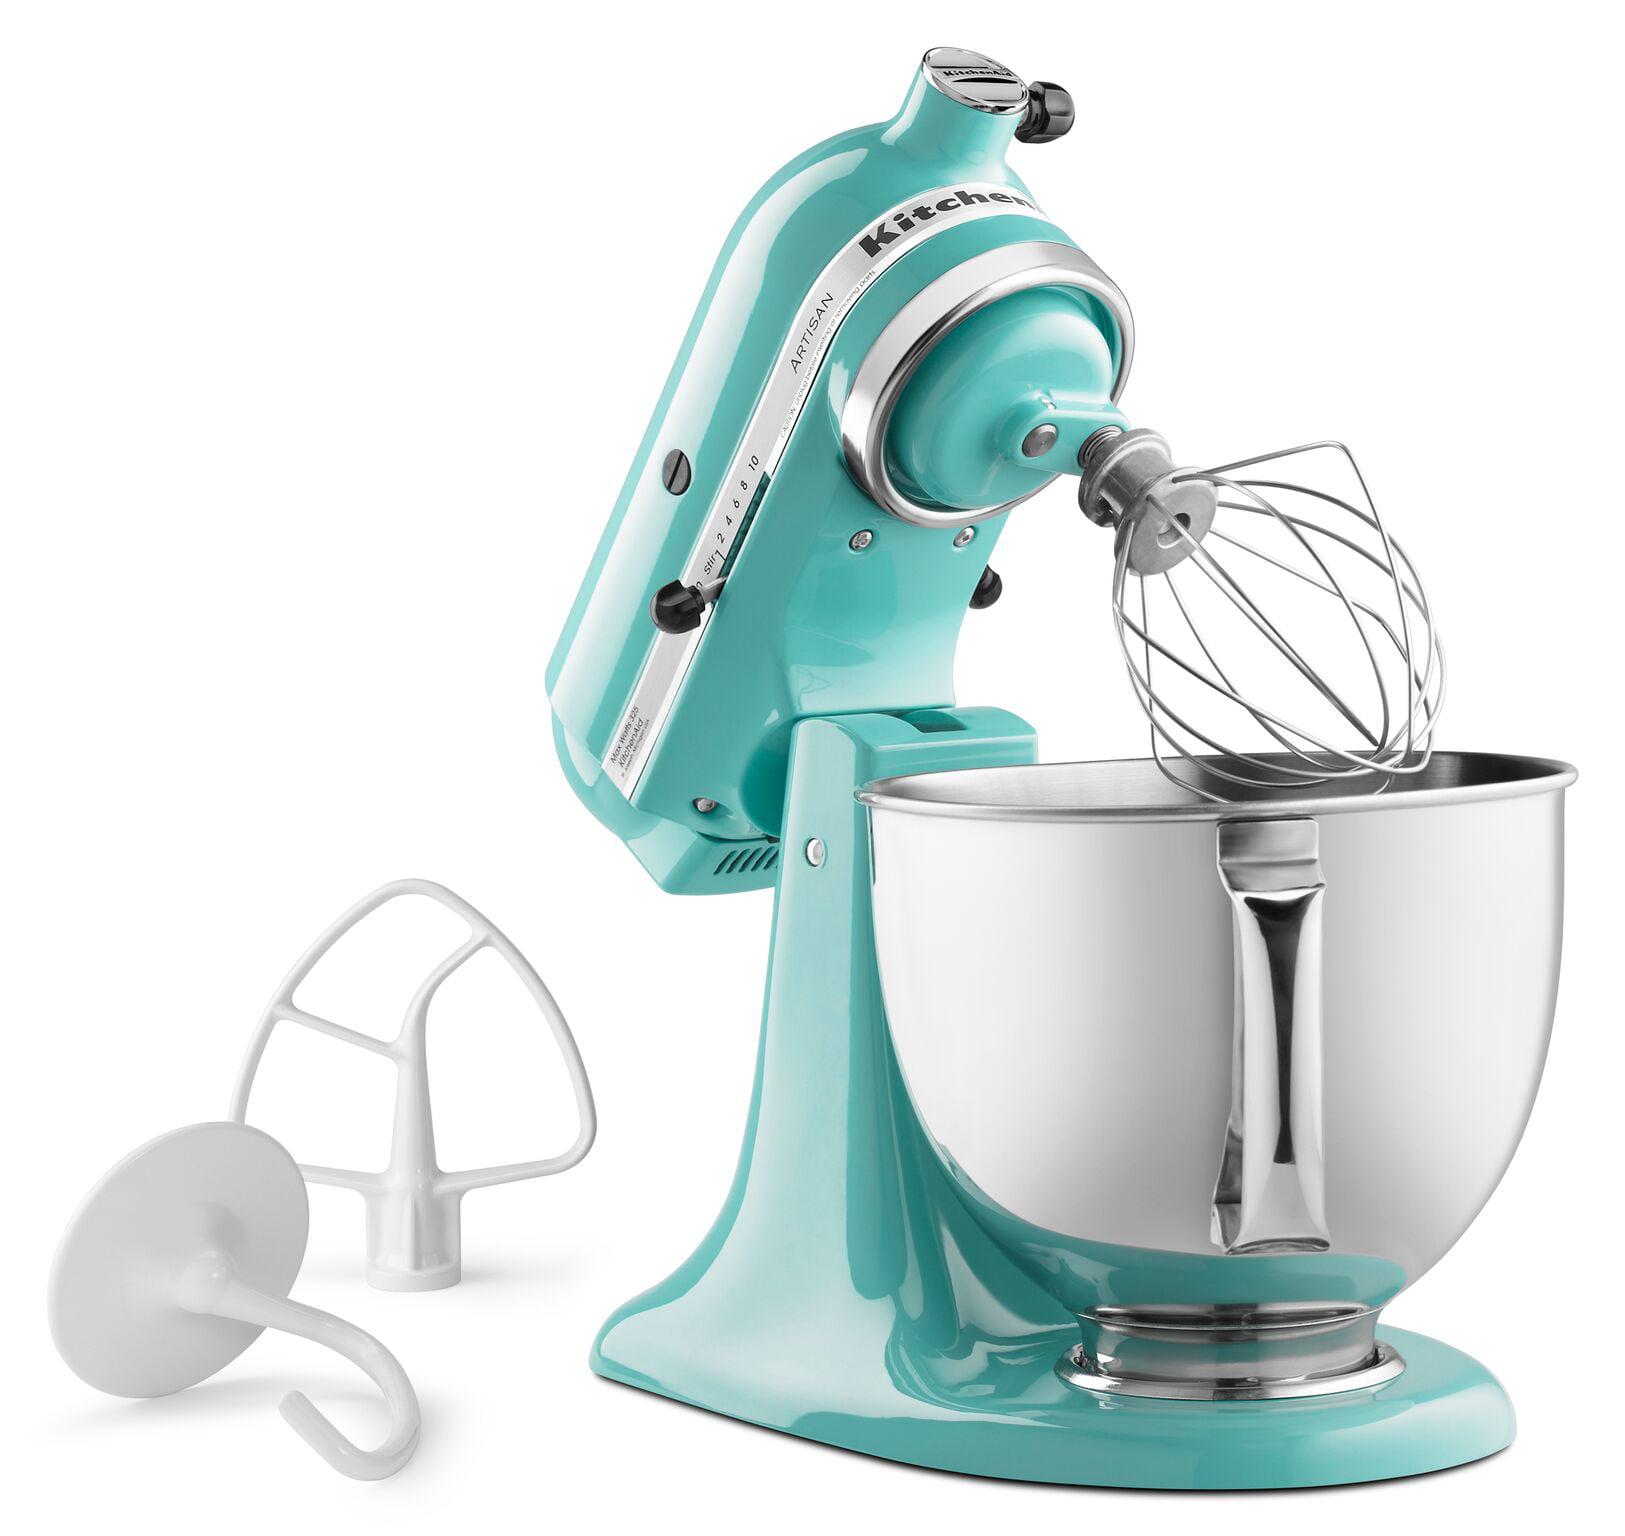 Beautiful KitchenAid Artisan Series 5 Quart Tilt Head Stand Mixer, Aqua Sky  (KSM150PSAQ)   Walmart.com